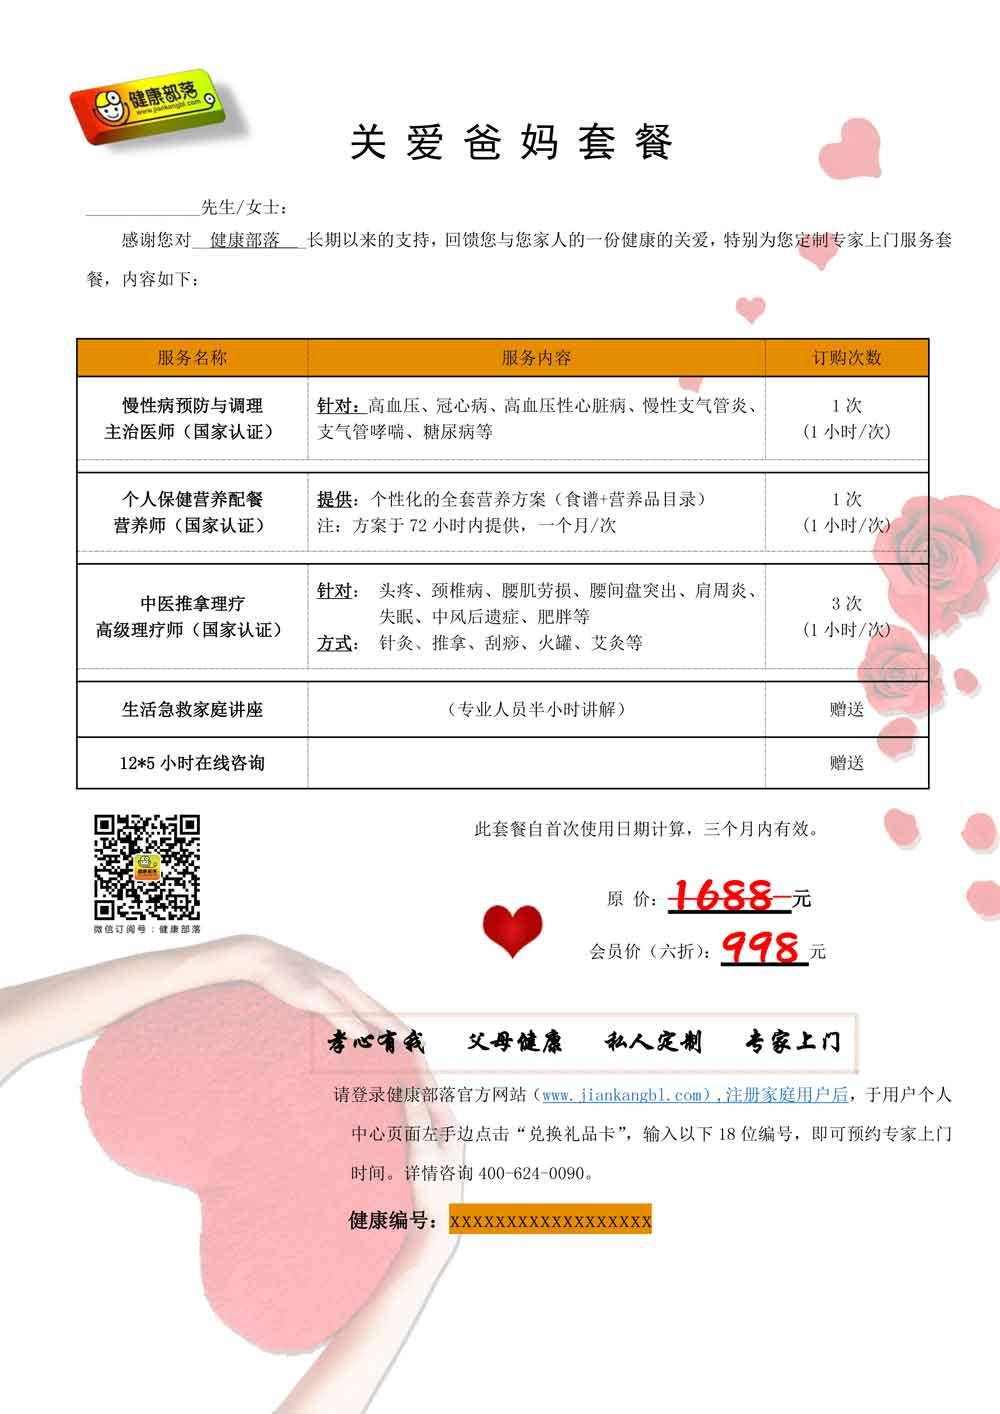 http://www.jiankangbl.com:80/attachment/pic/3E165F71-B962-9207-C4E9-1A1CAAD9D0BA.jpg